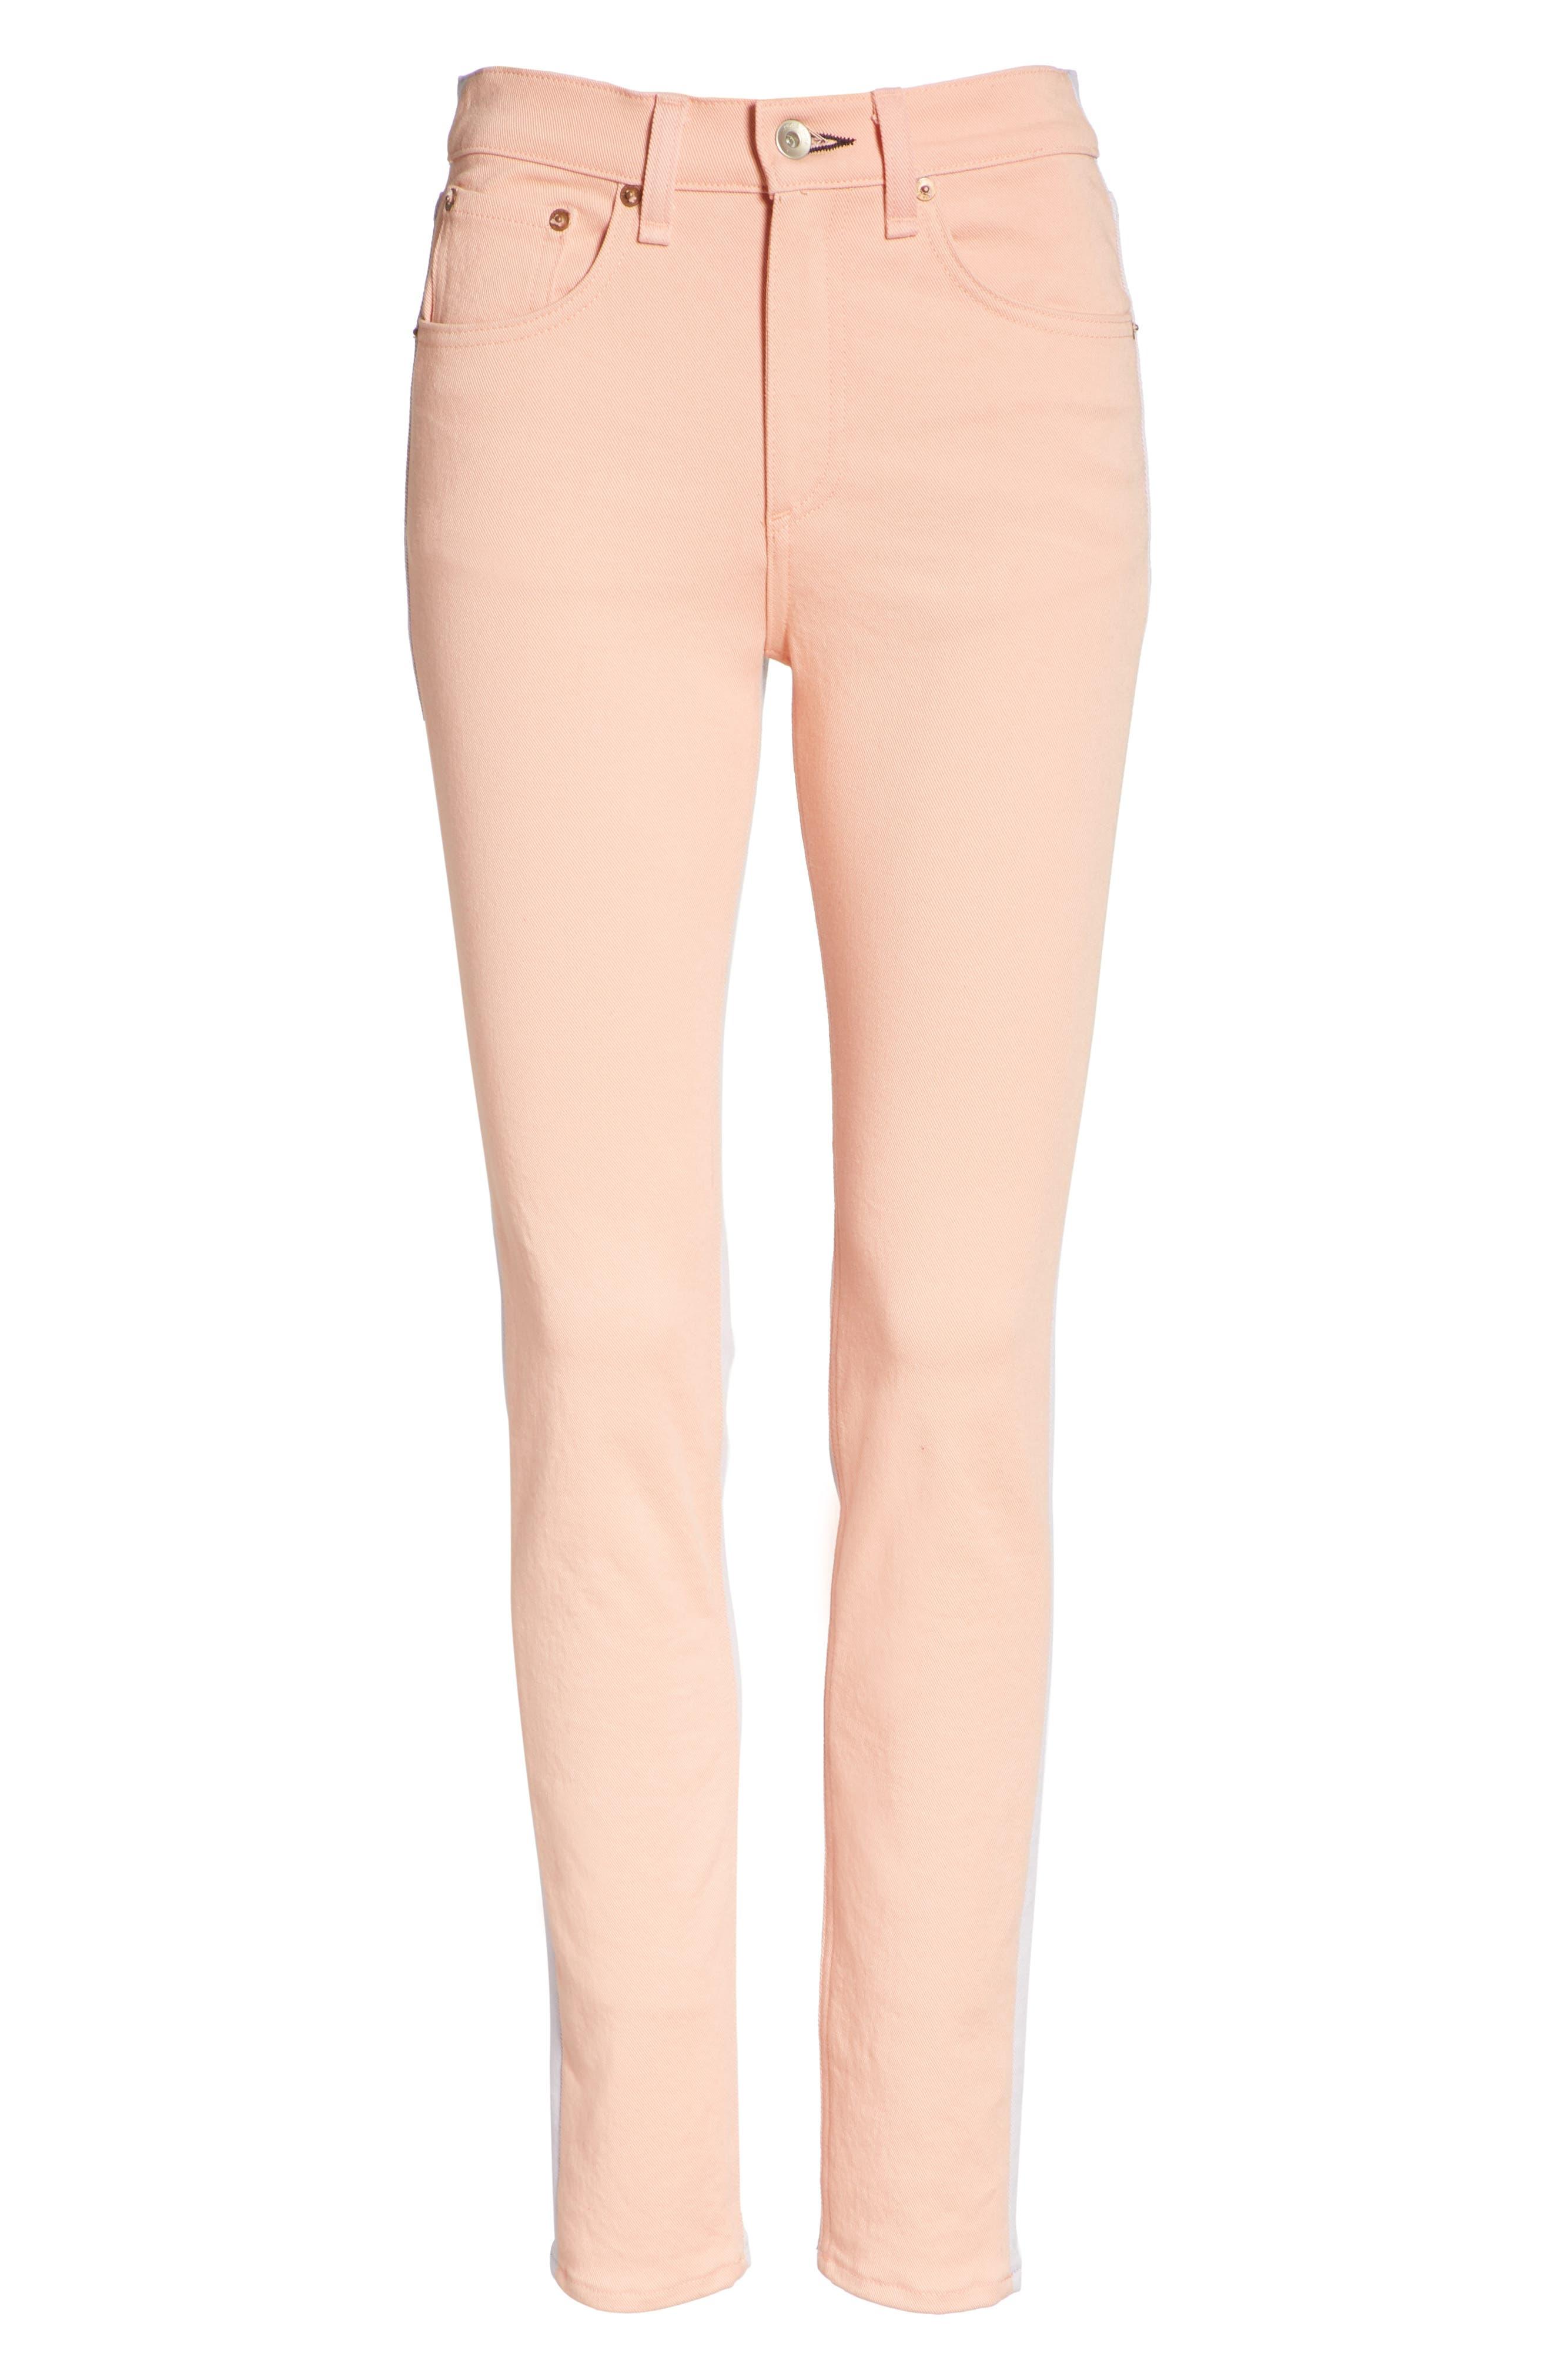 High Waist Skinny Jeans,                             Alternate thumbnail 6, color,                             Peach/ Lilac